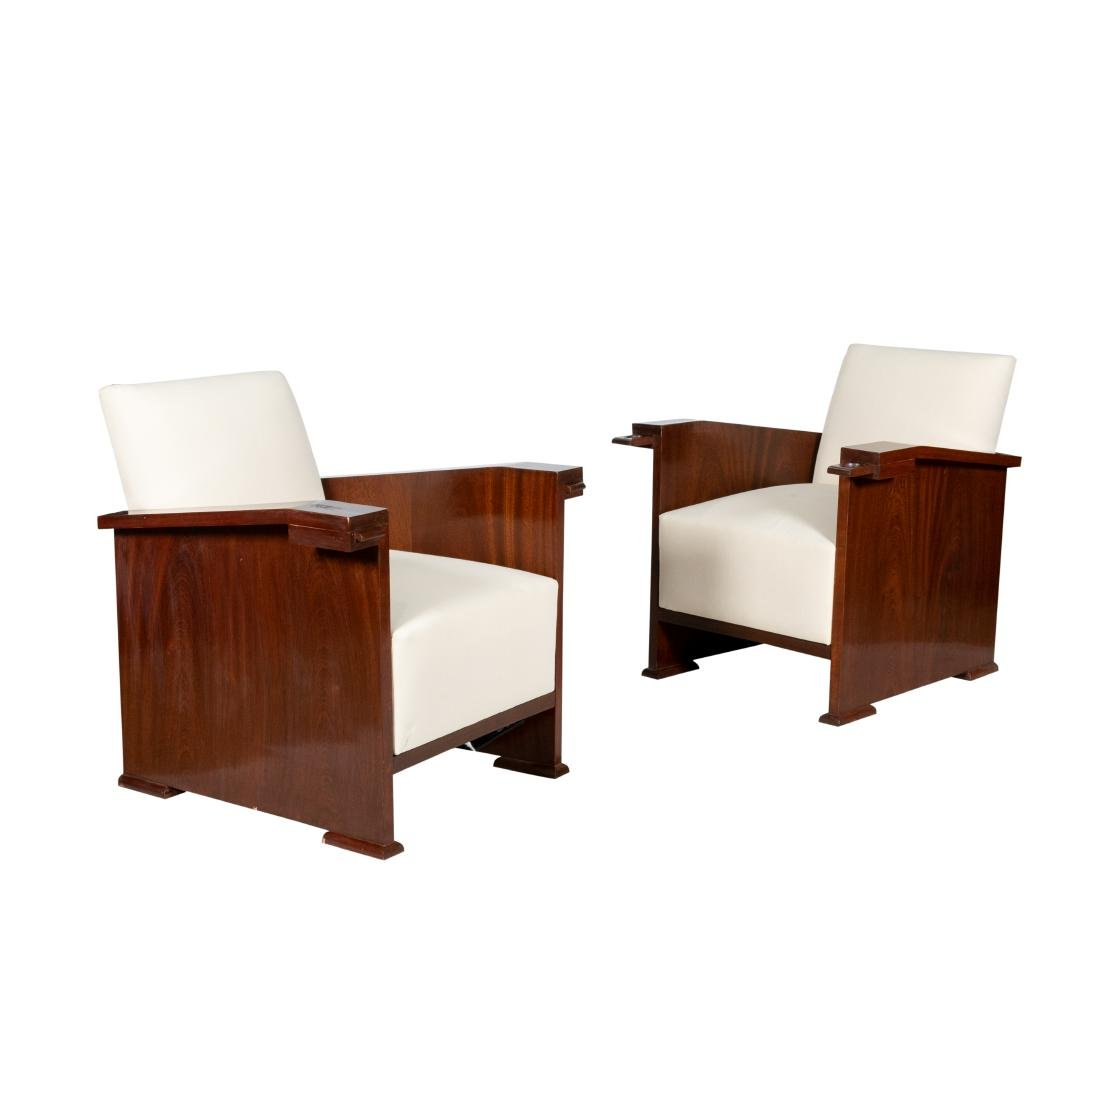 Pair Mahogany Deco Chairs